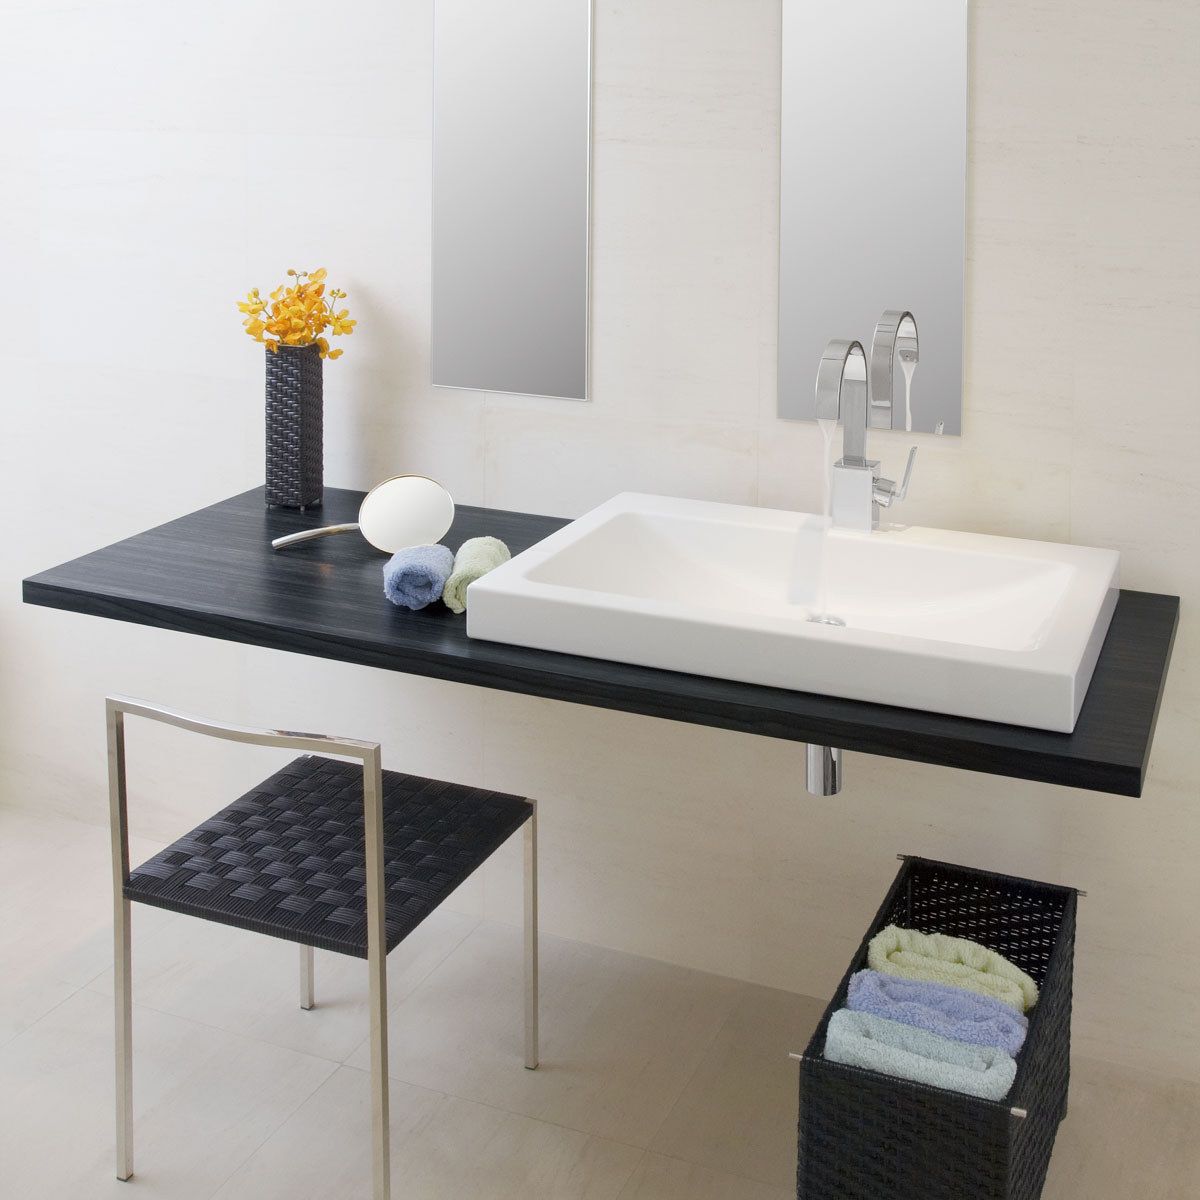 Alape リラインス 置き型手洗器 Alapeアラペ AB.R800H